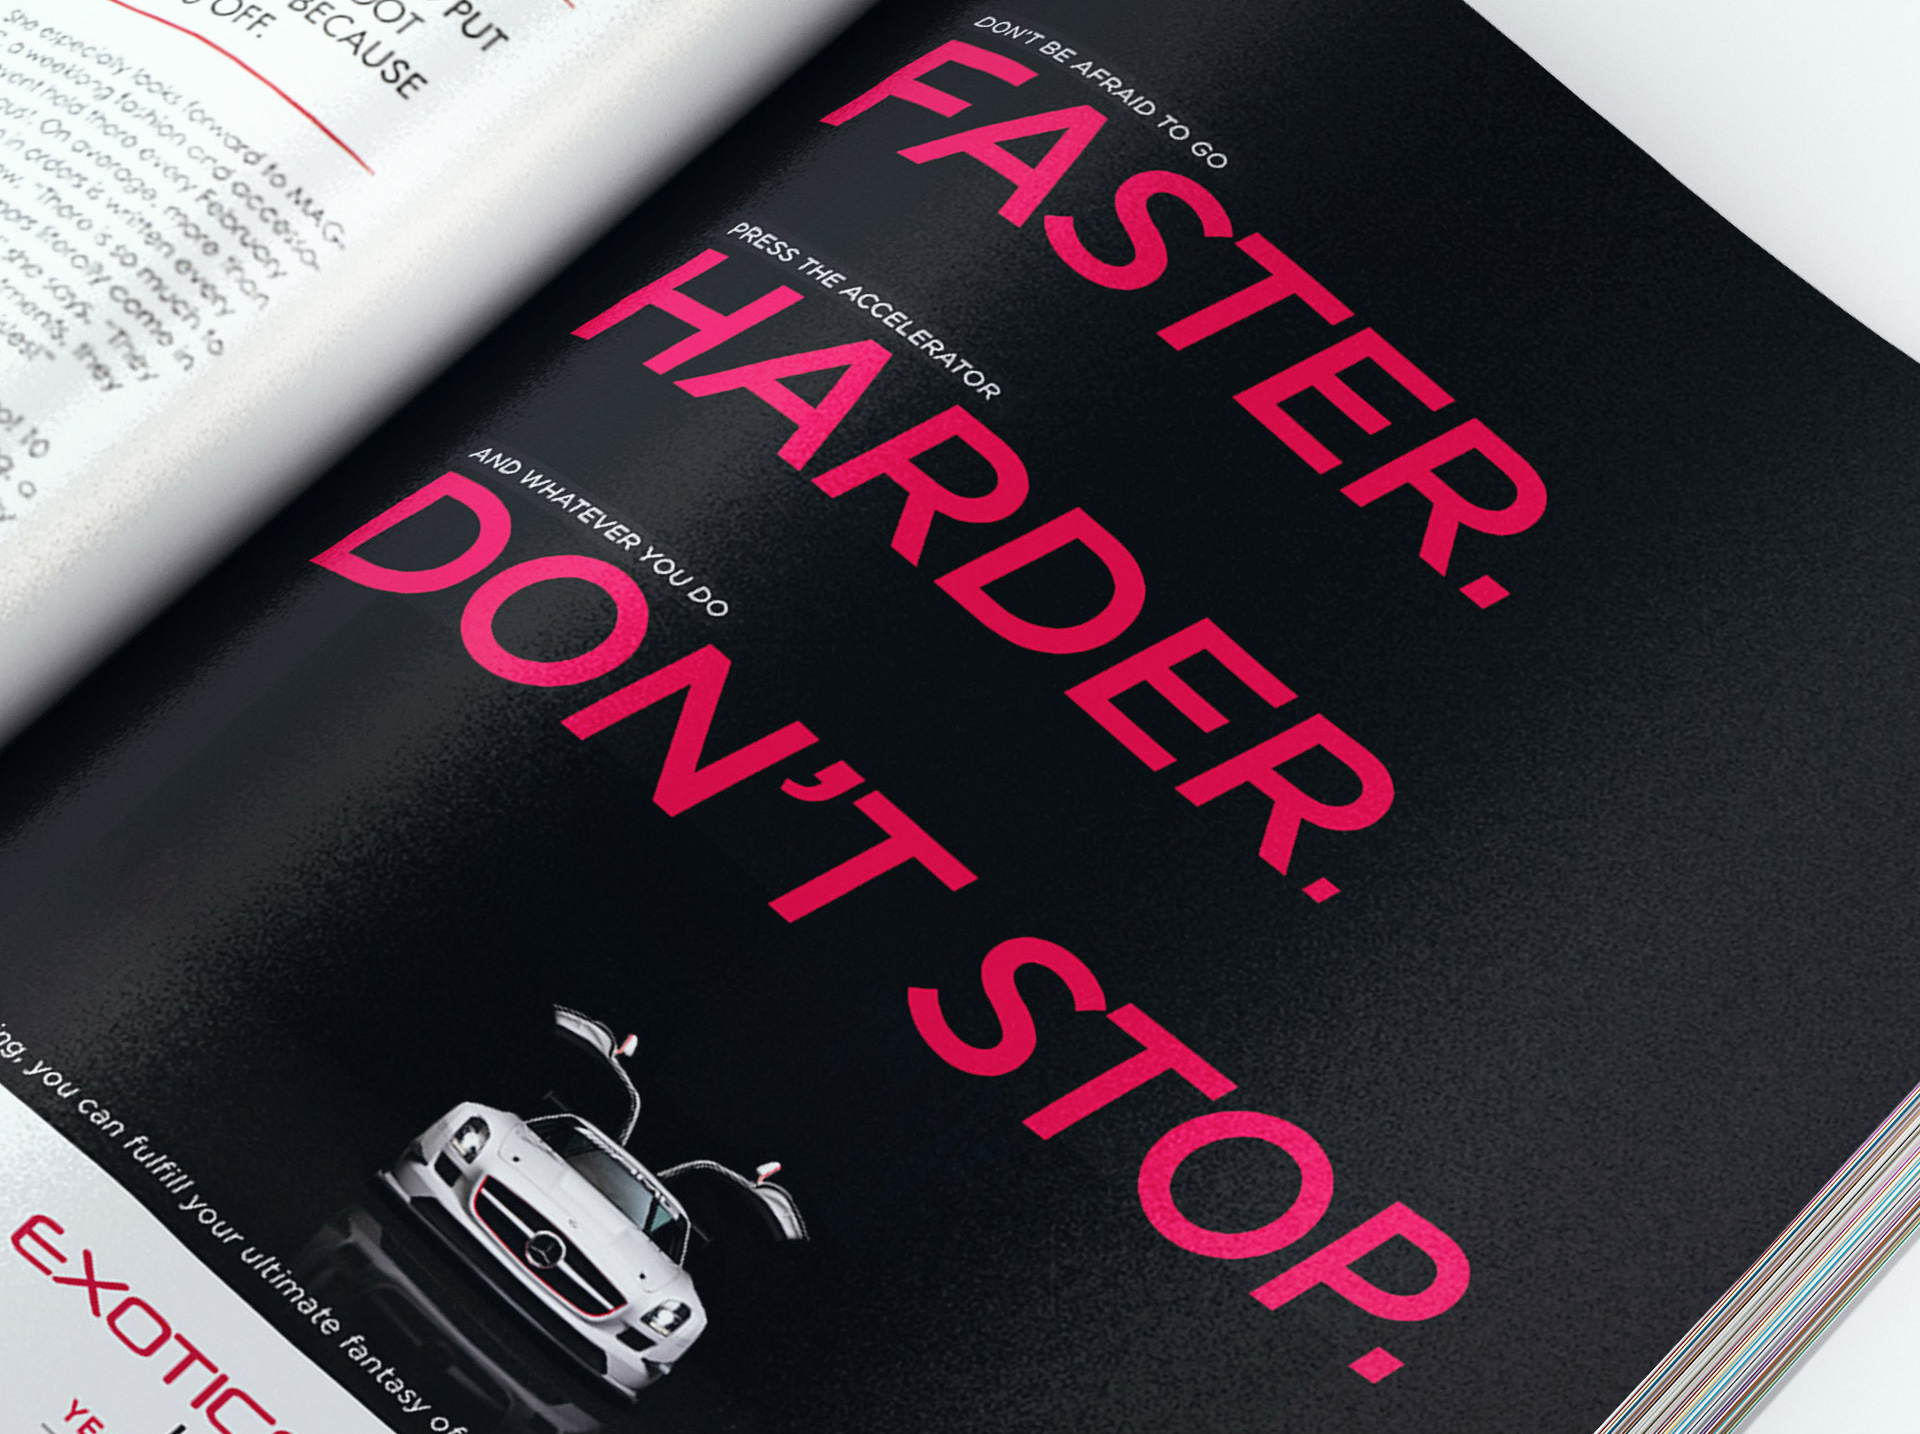 Magazine ad detail - faster